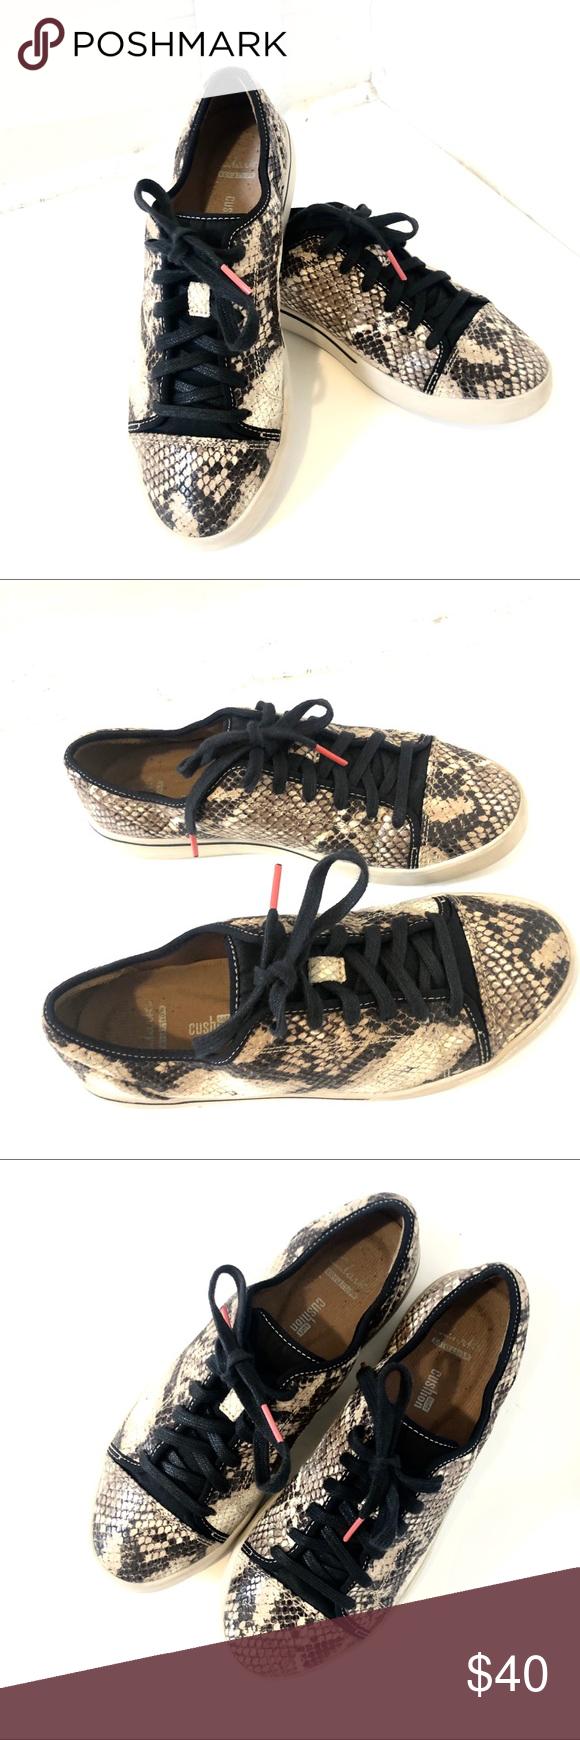 Snakeskin Clark's Tennis shoes   Tennis